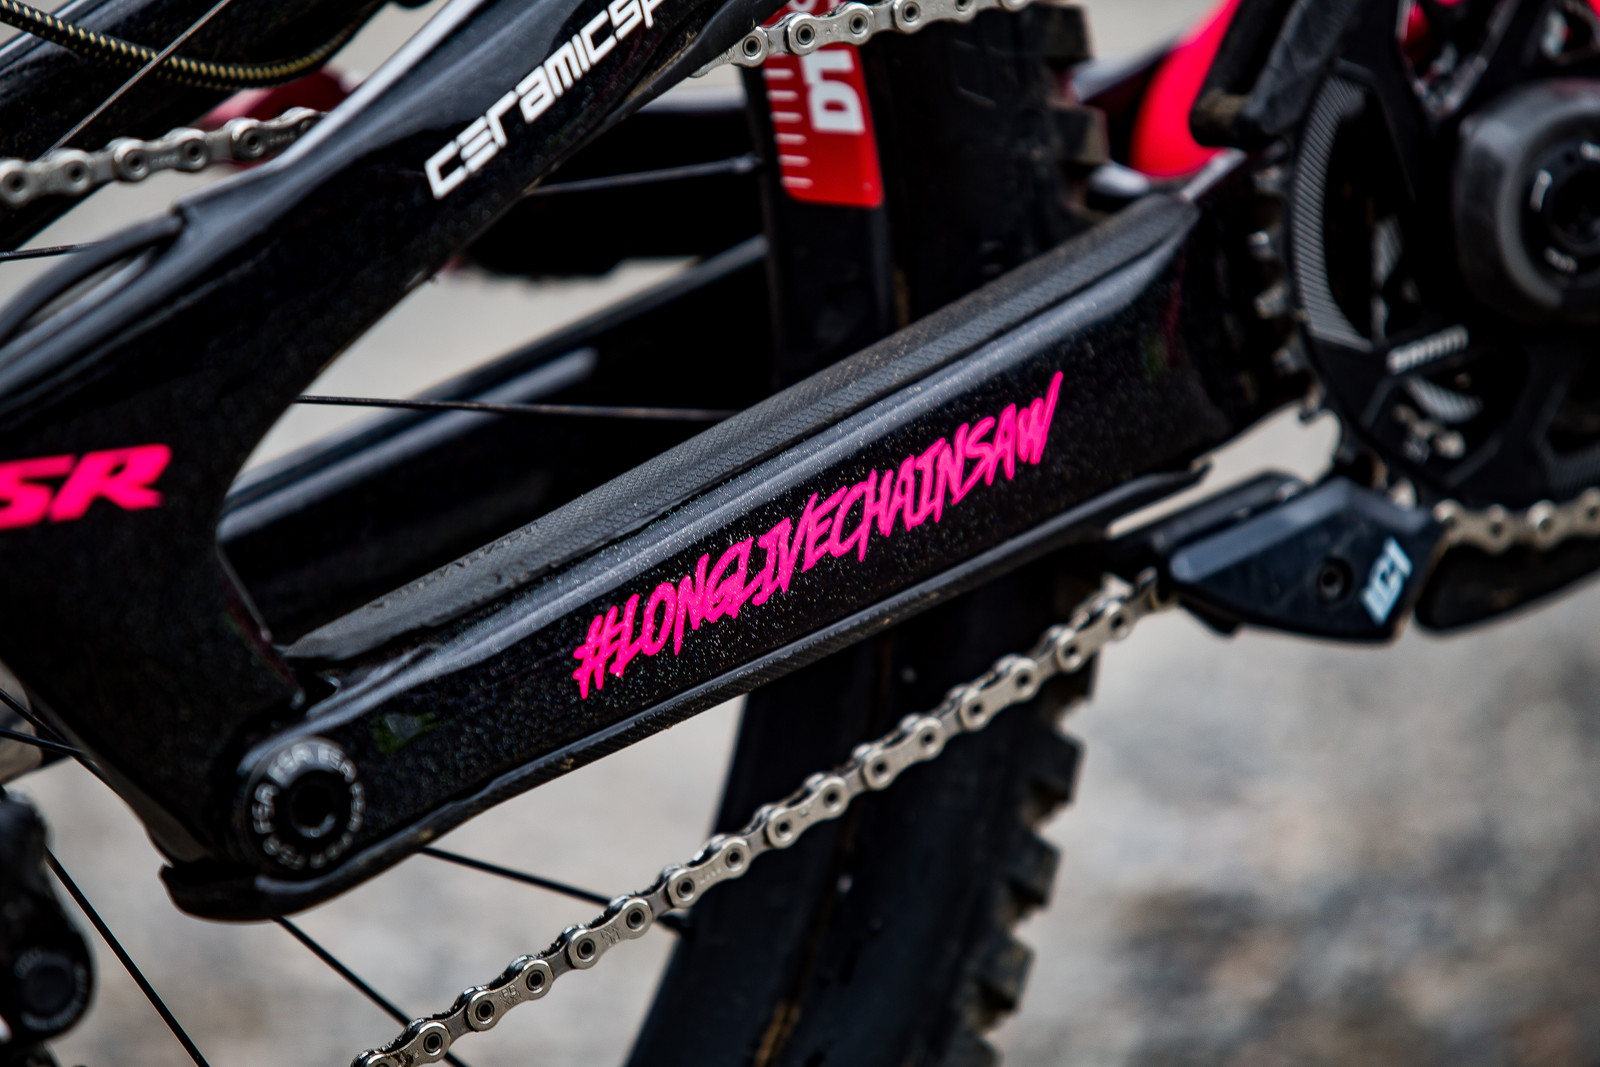 #longlivechainsaw - WINNING BIKE: Finn Iles' Specialized S-Works Demo - Mountain Biking Pictures - Vital MTB